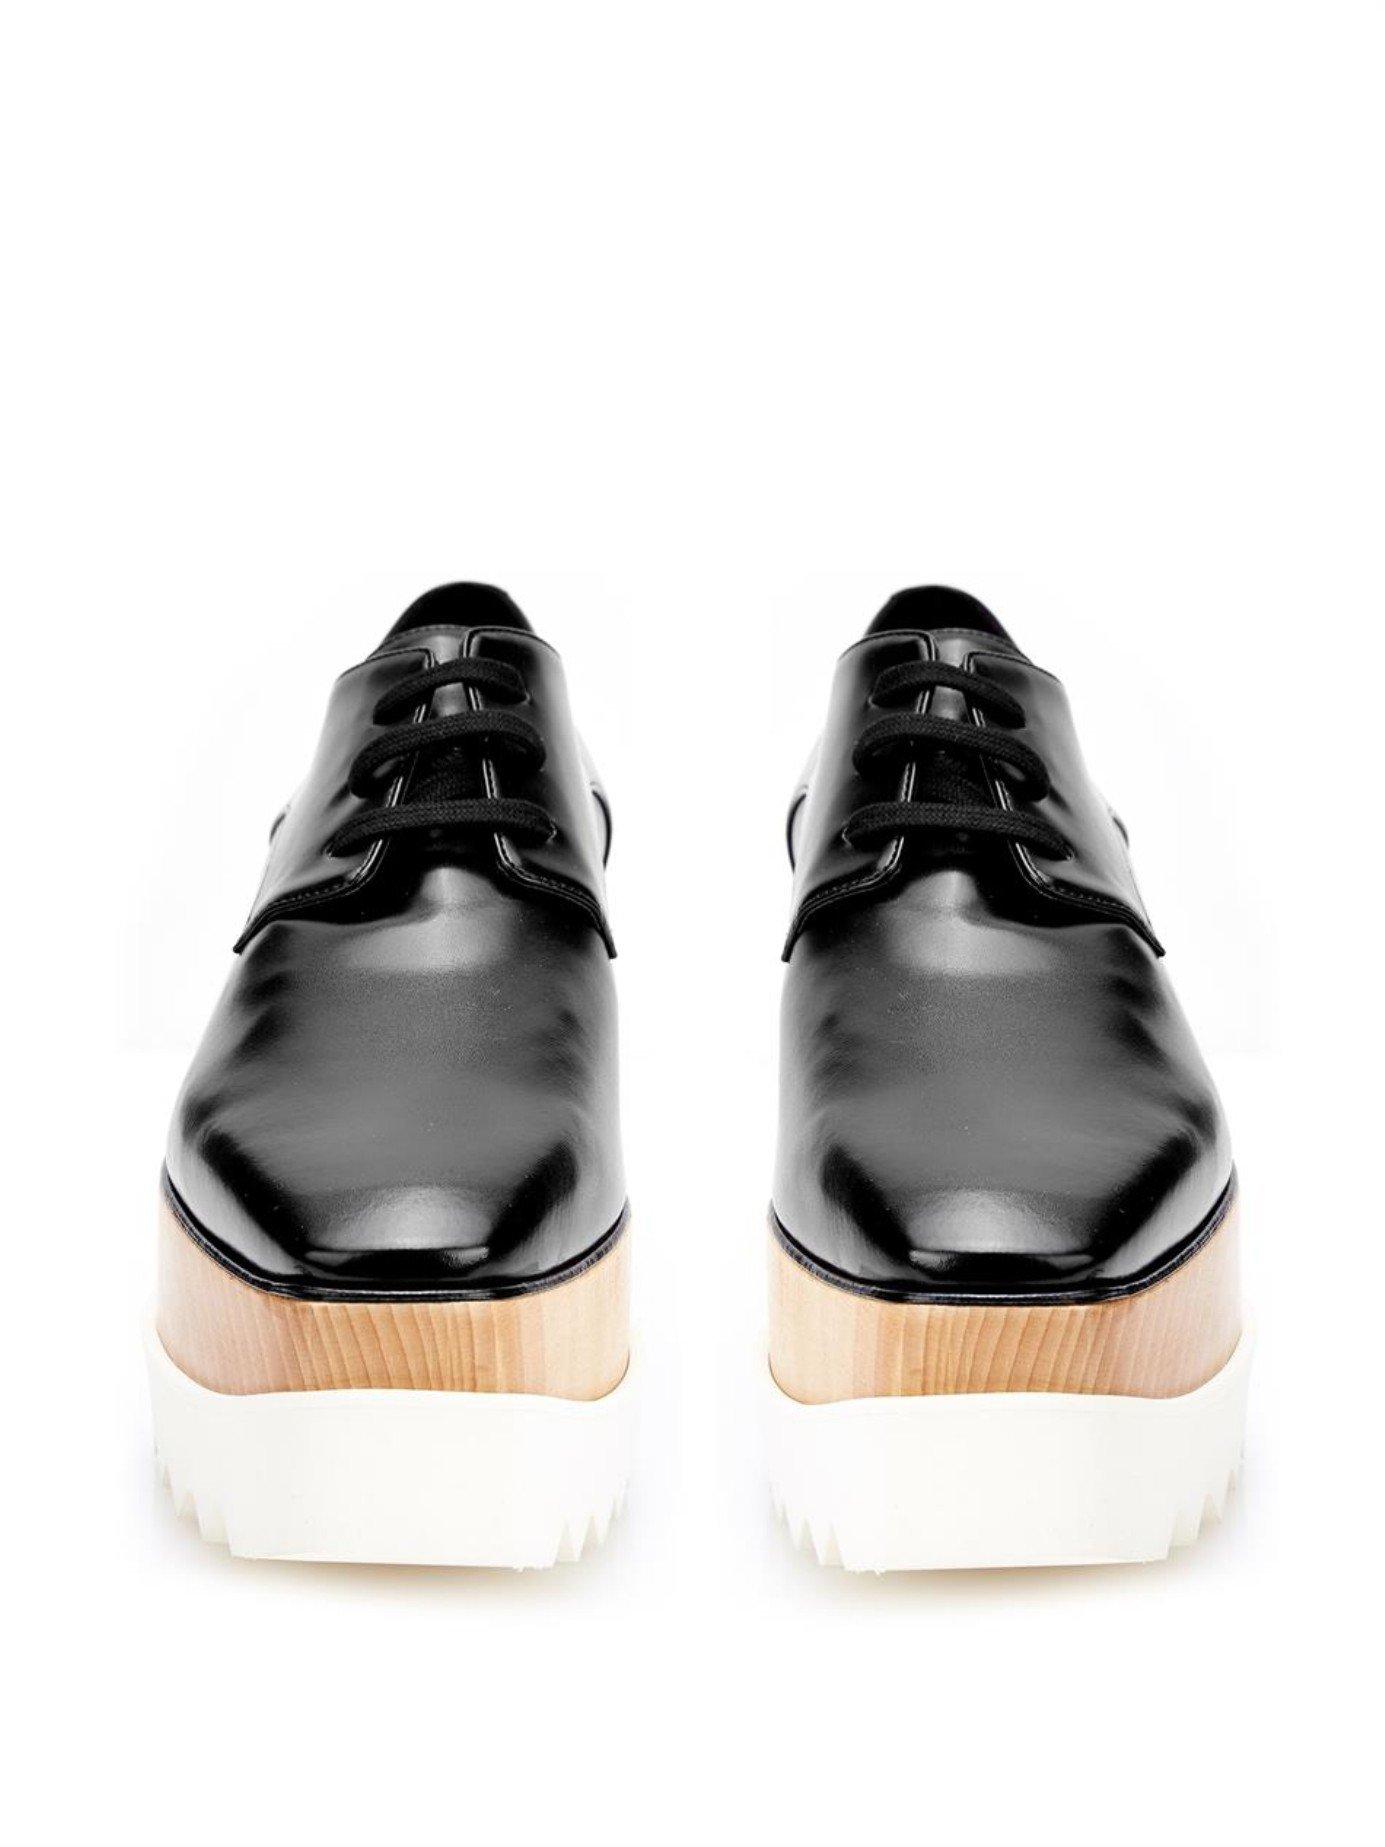 8471d17b5ddb Lyst - Stella Mccartney Elyse Lace-up Platform Shoes in Black